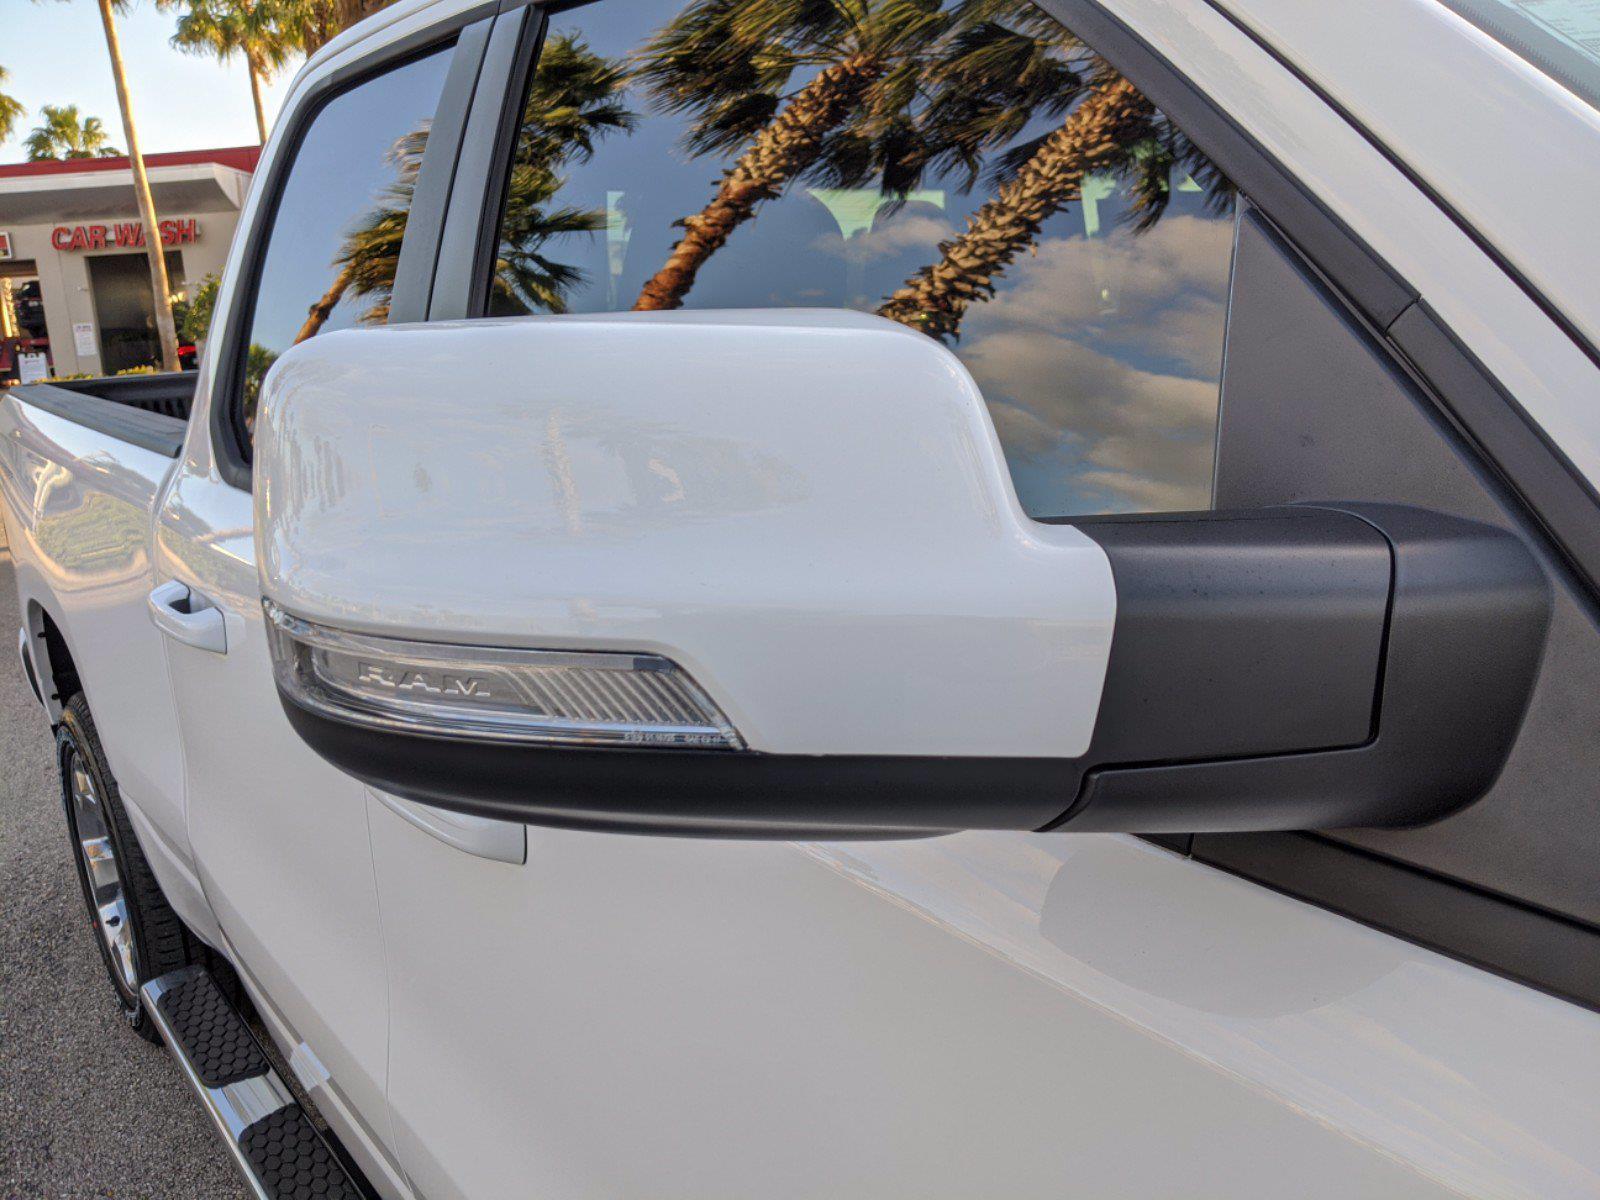 2021 Ram 1500 Quad Cab 4x4, Pickup #R21236 - photo 2